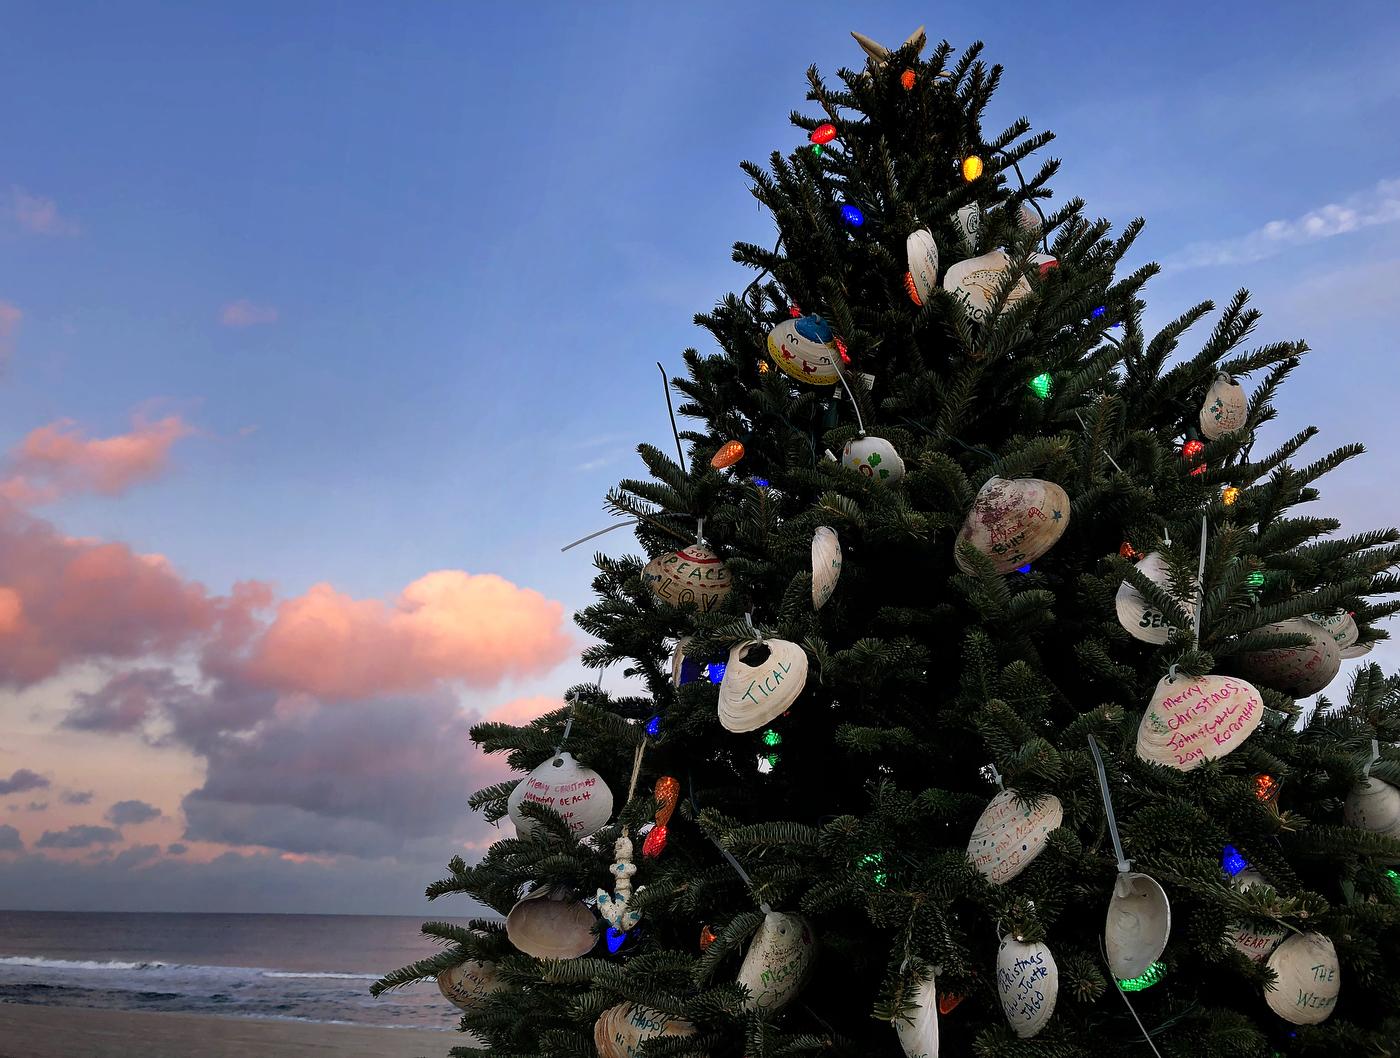 Children Christmas, Saturday, December 8,2021 In Atlantic County, Nj 9 Jersey Shore Towns Worth Visiting This Holiday Season Nj Com